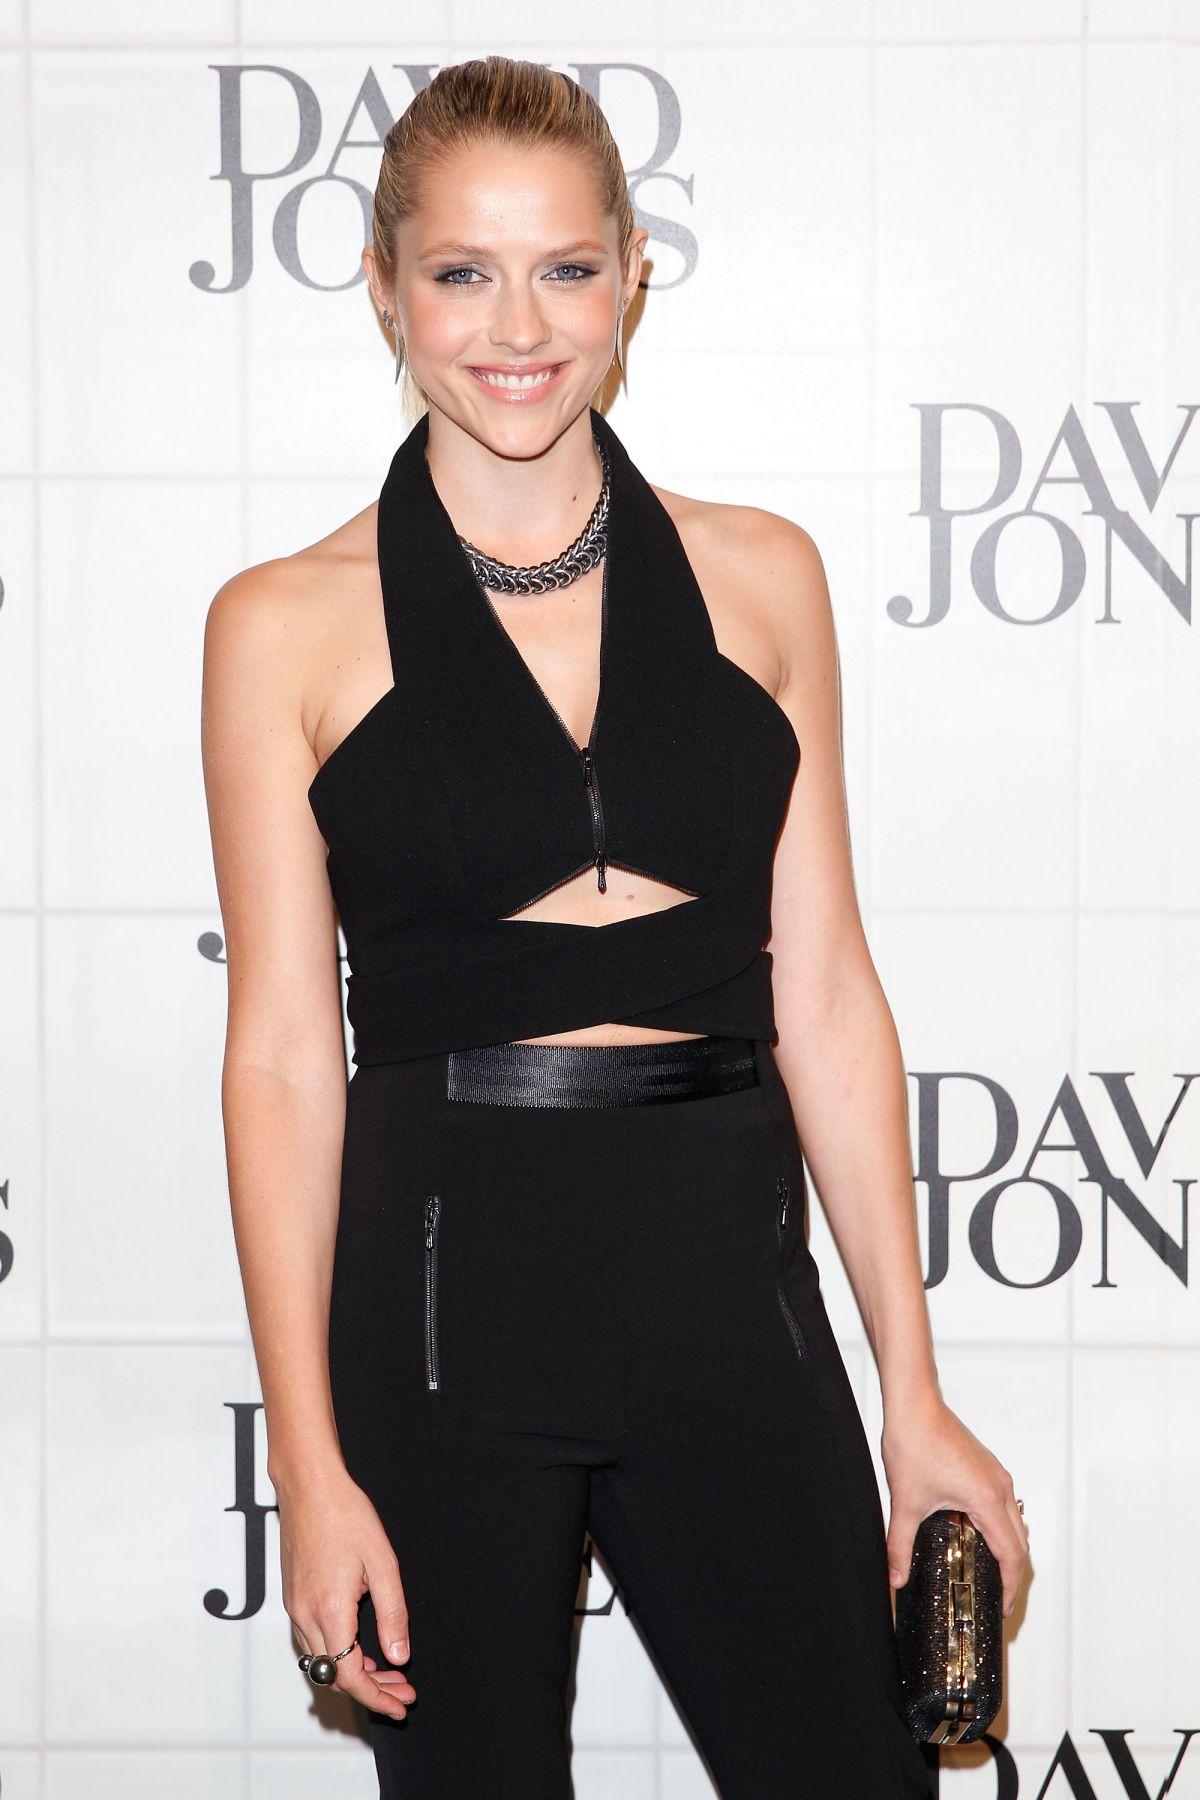 TERESA PALMER at David Dones Fashion Show in Sydney